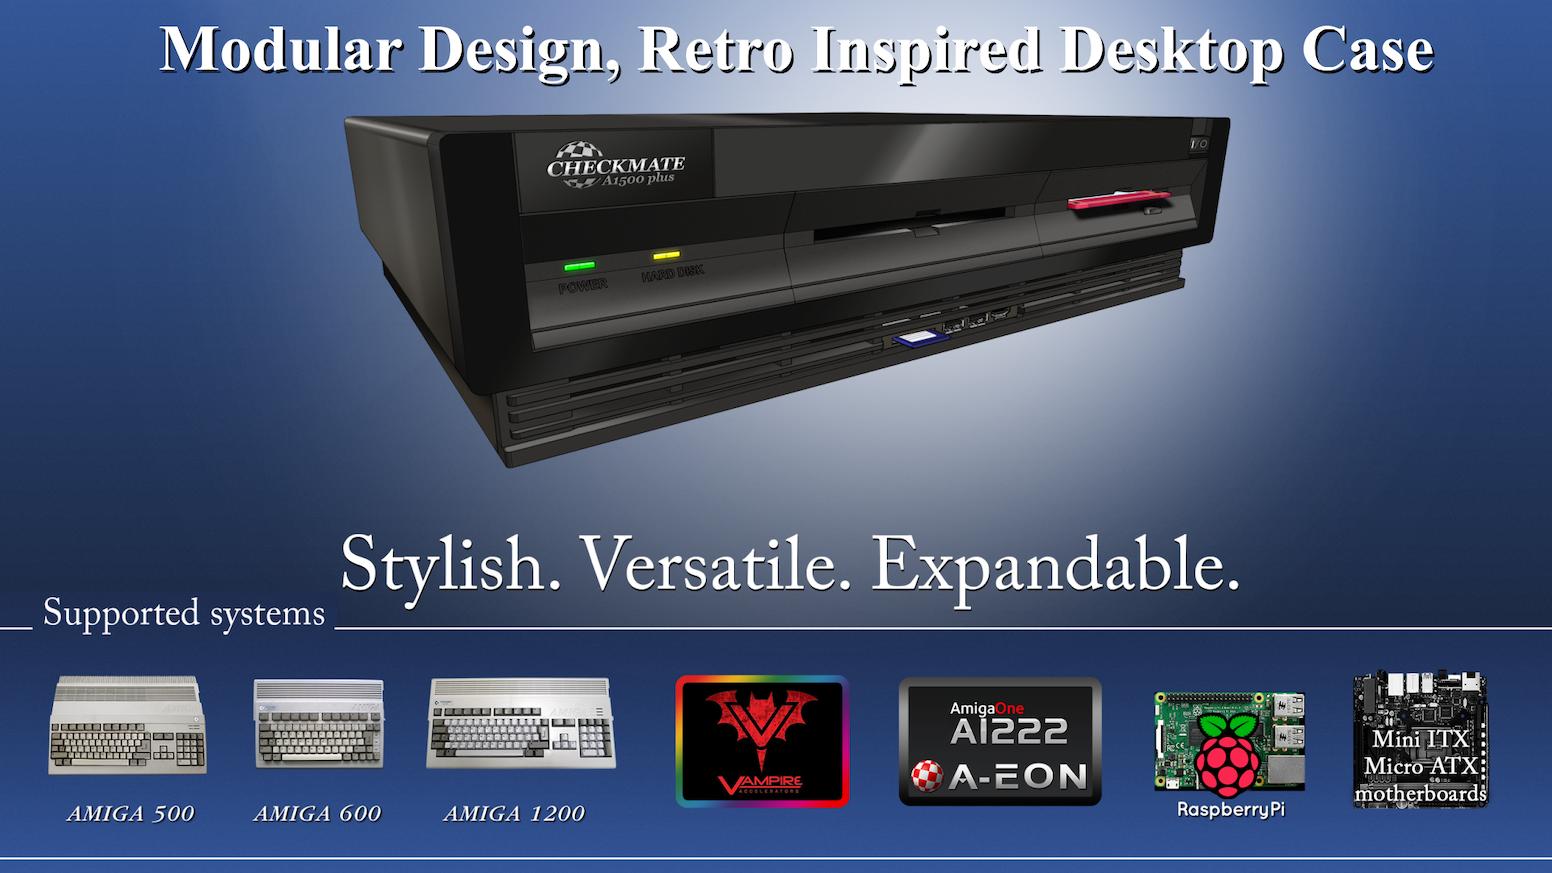 Amiga 3000 inspired modular Amiga/PC desktop computer case by